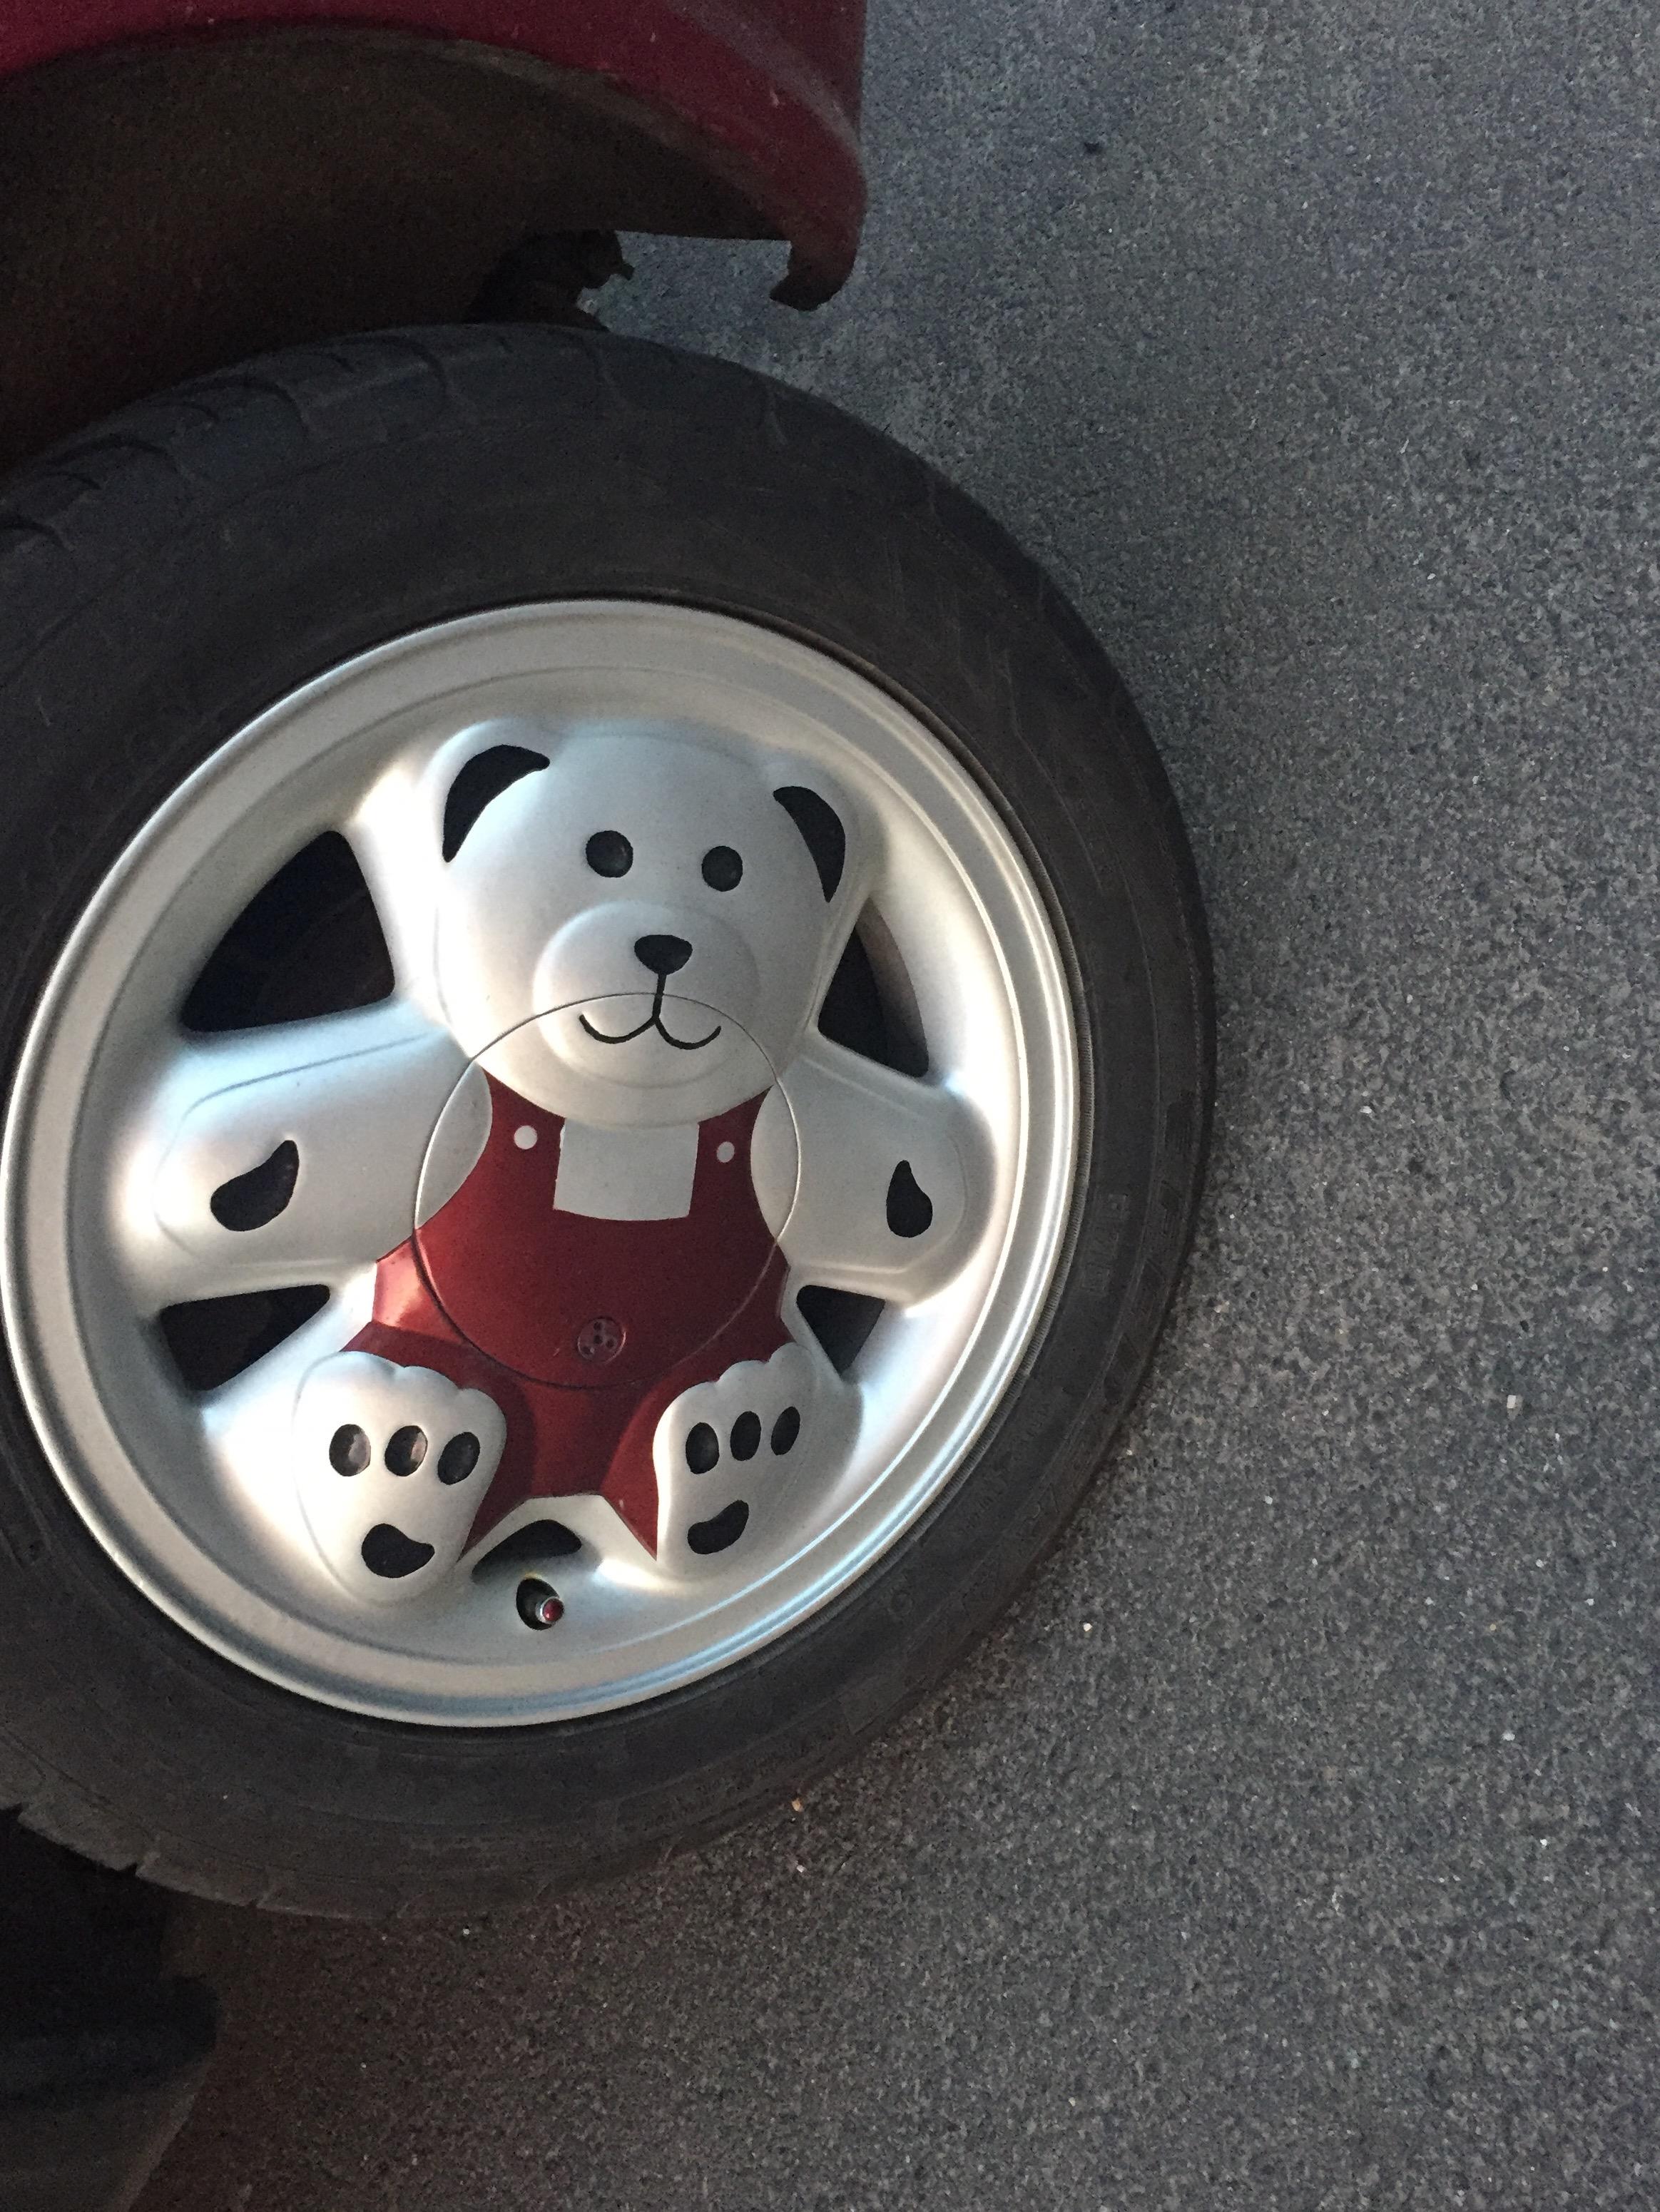 97 Felgenwerks Usa Felgenwerks Retro Bear V2 15x8 Teddybear